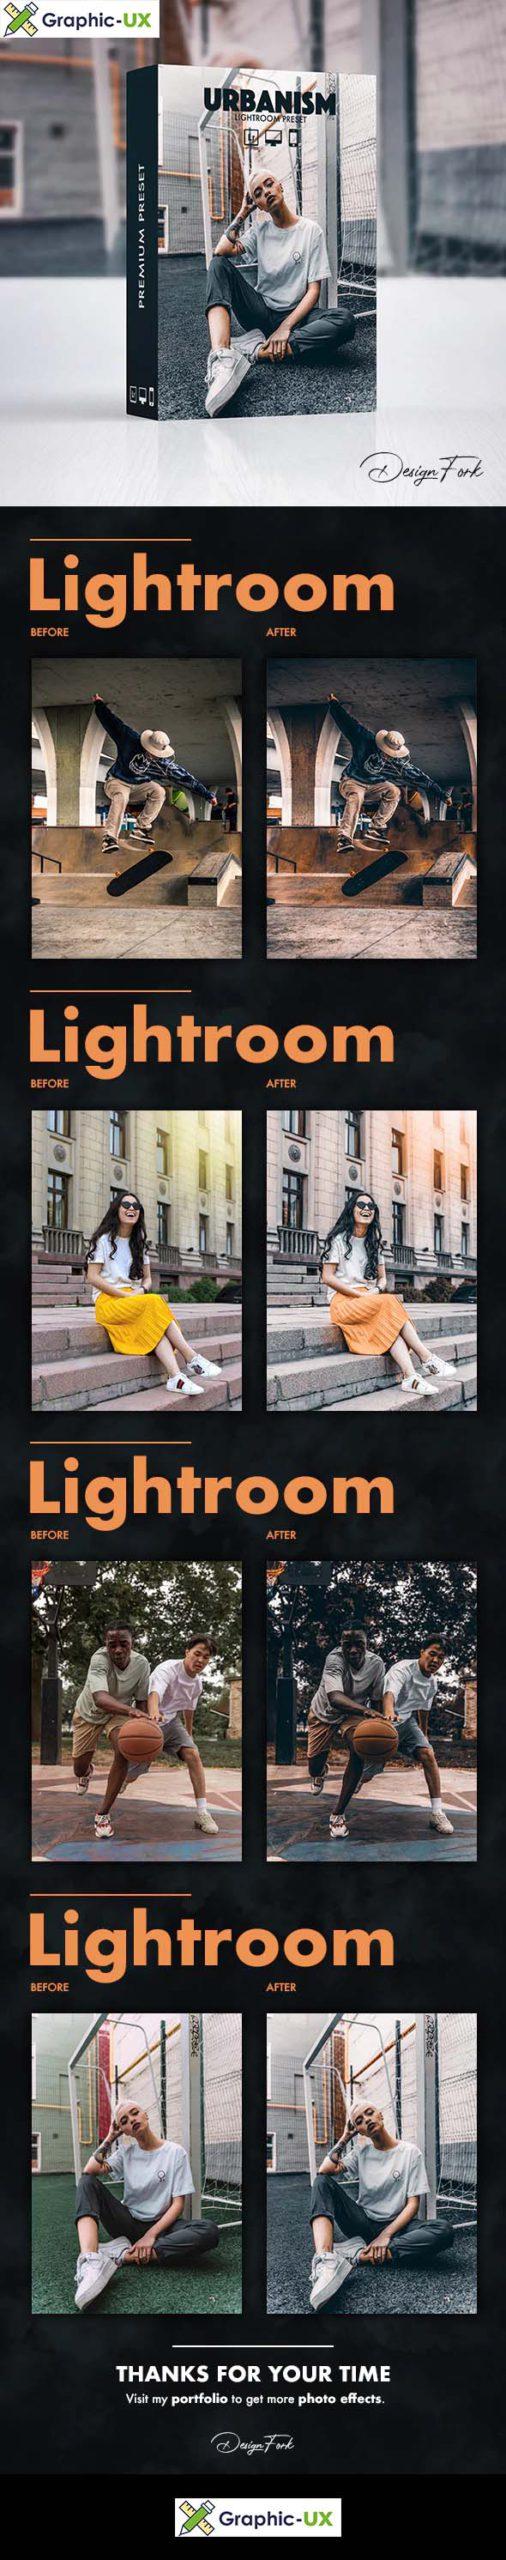 Urbanism FX Lightroom Preset